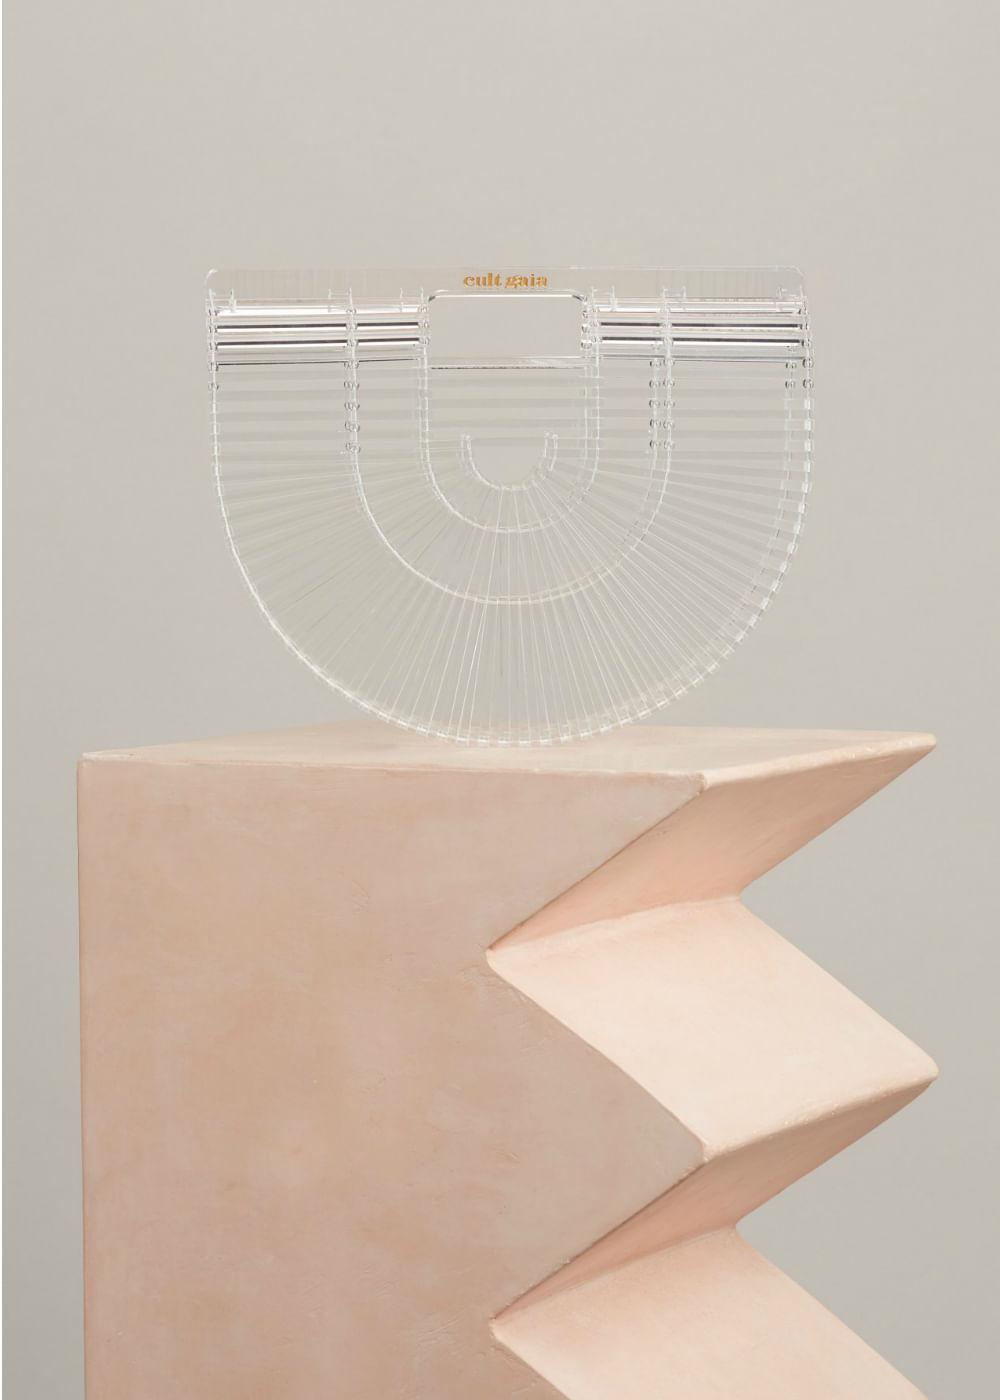 ark-transparente-cortada